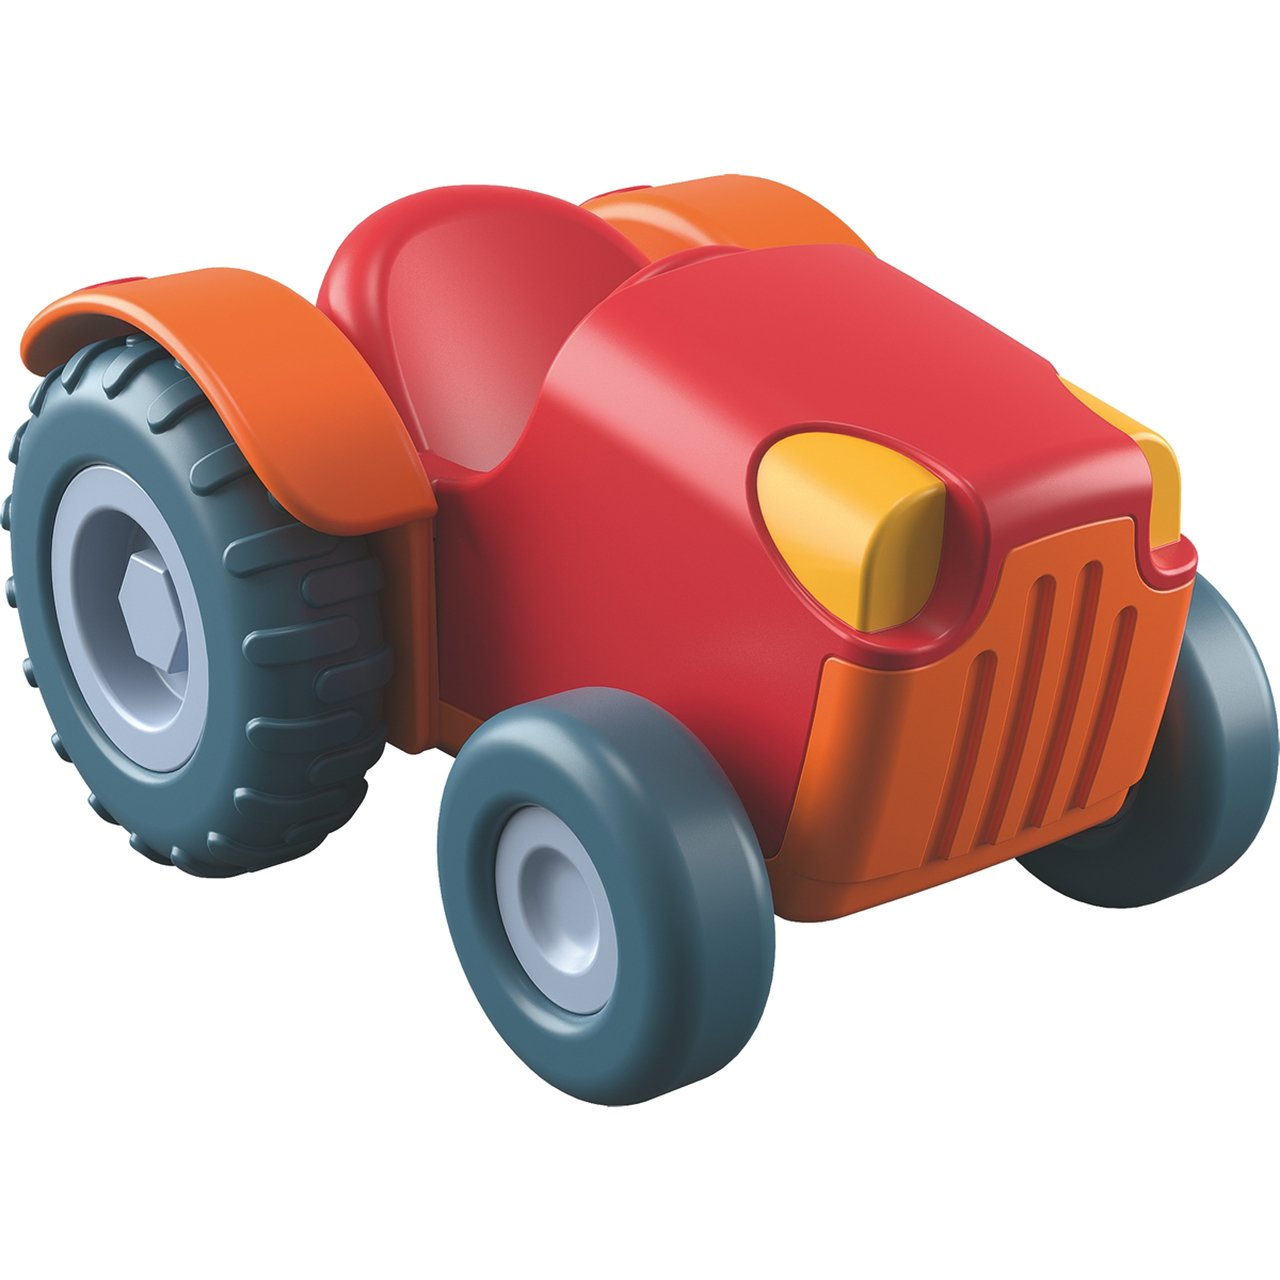 Little Friends Tractor